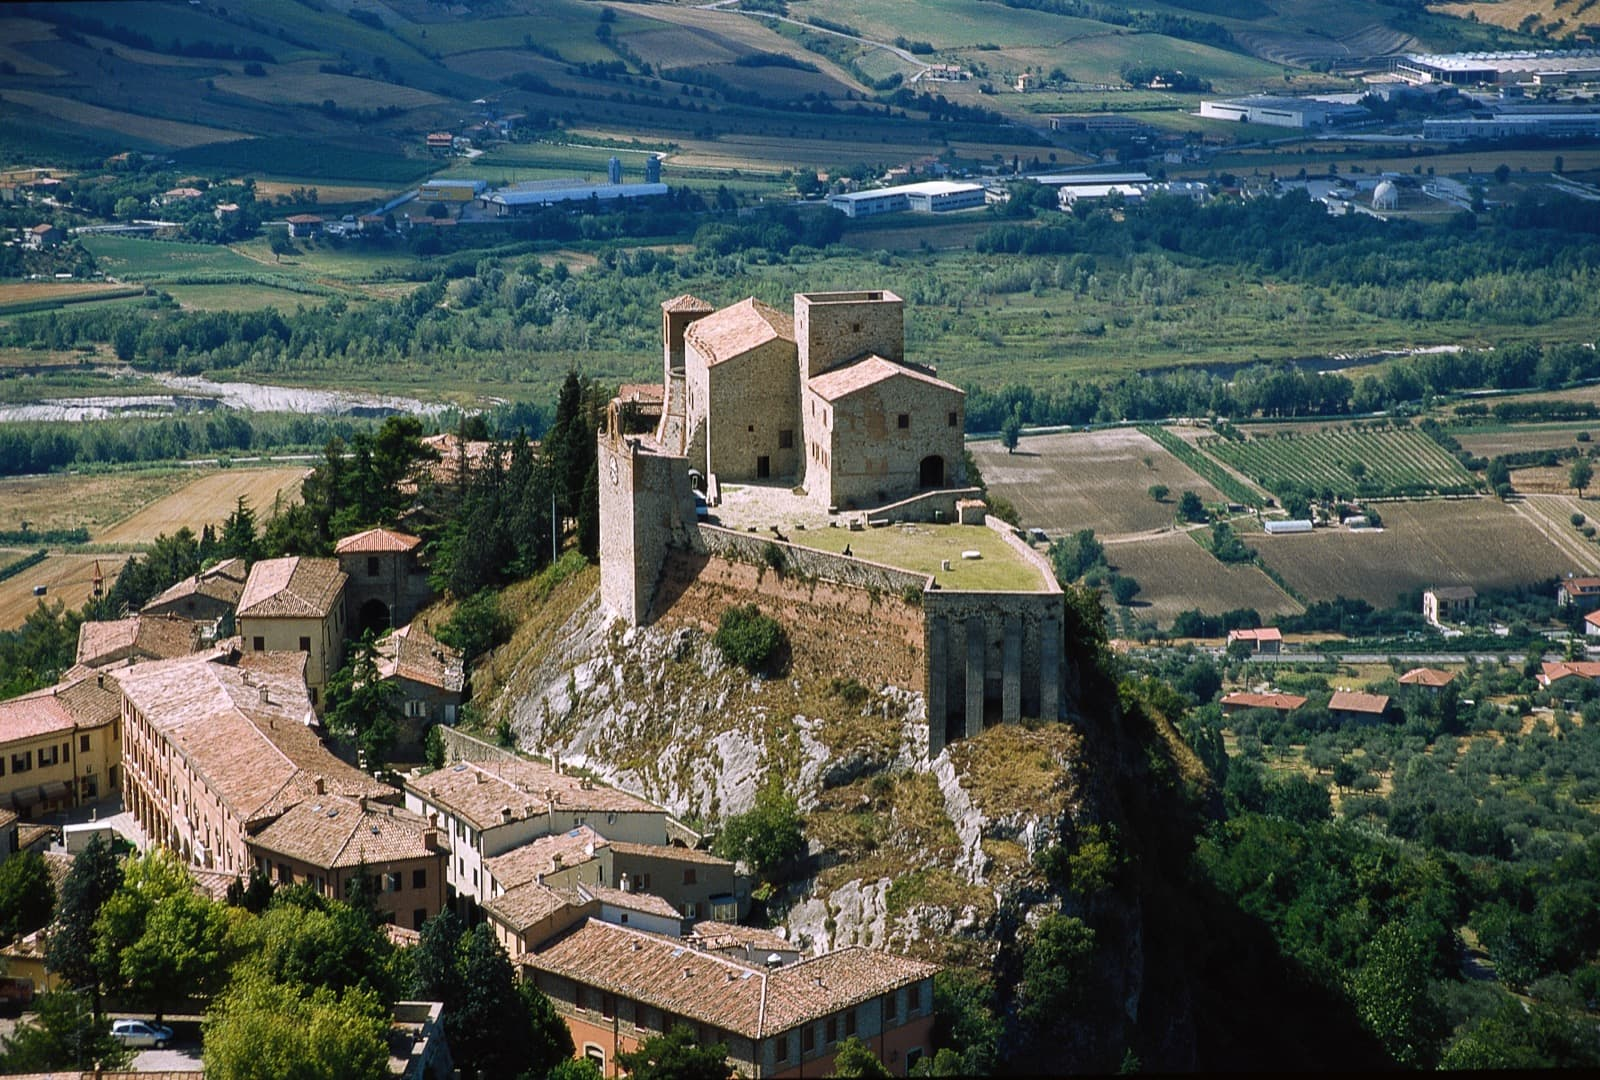 Verucchio, Rocca Malatestiana, via IAT Verucchio